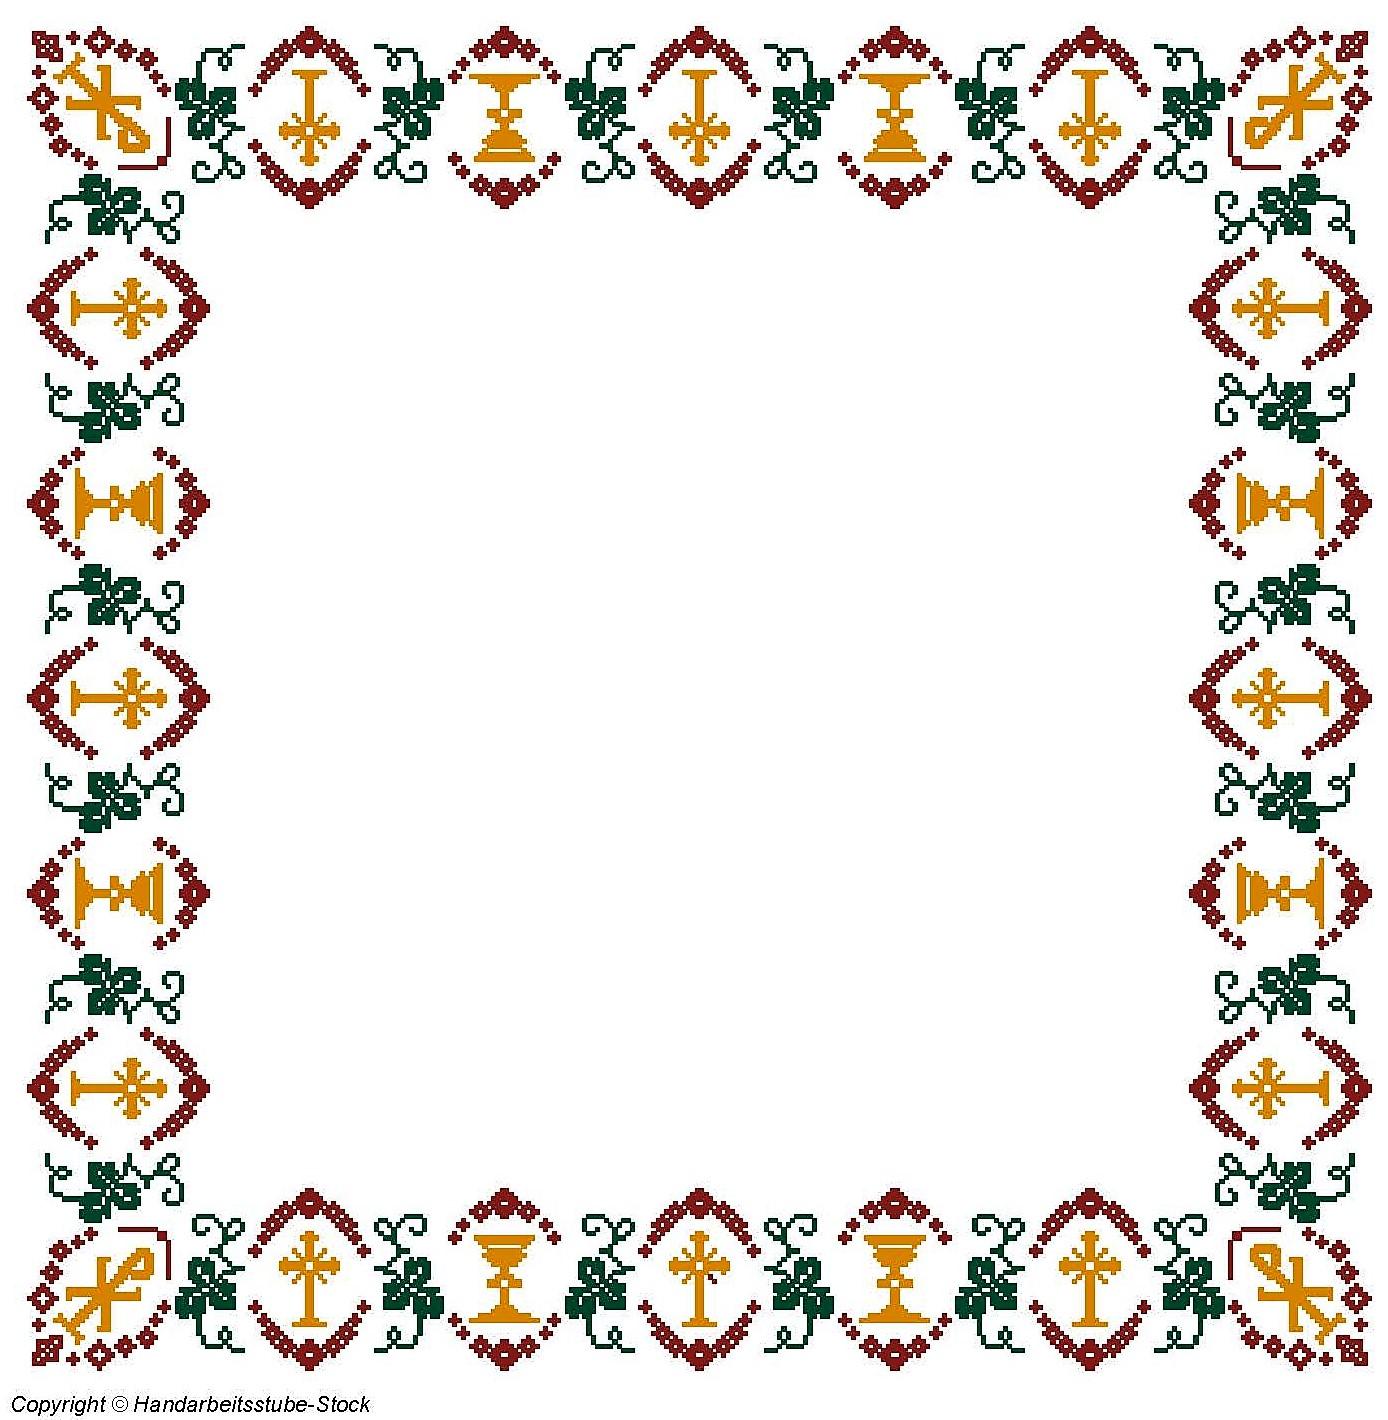 Altartuch - Bordüre 11